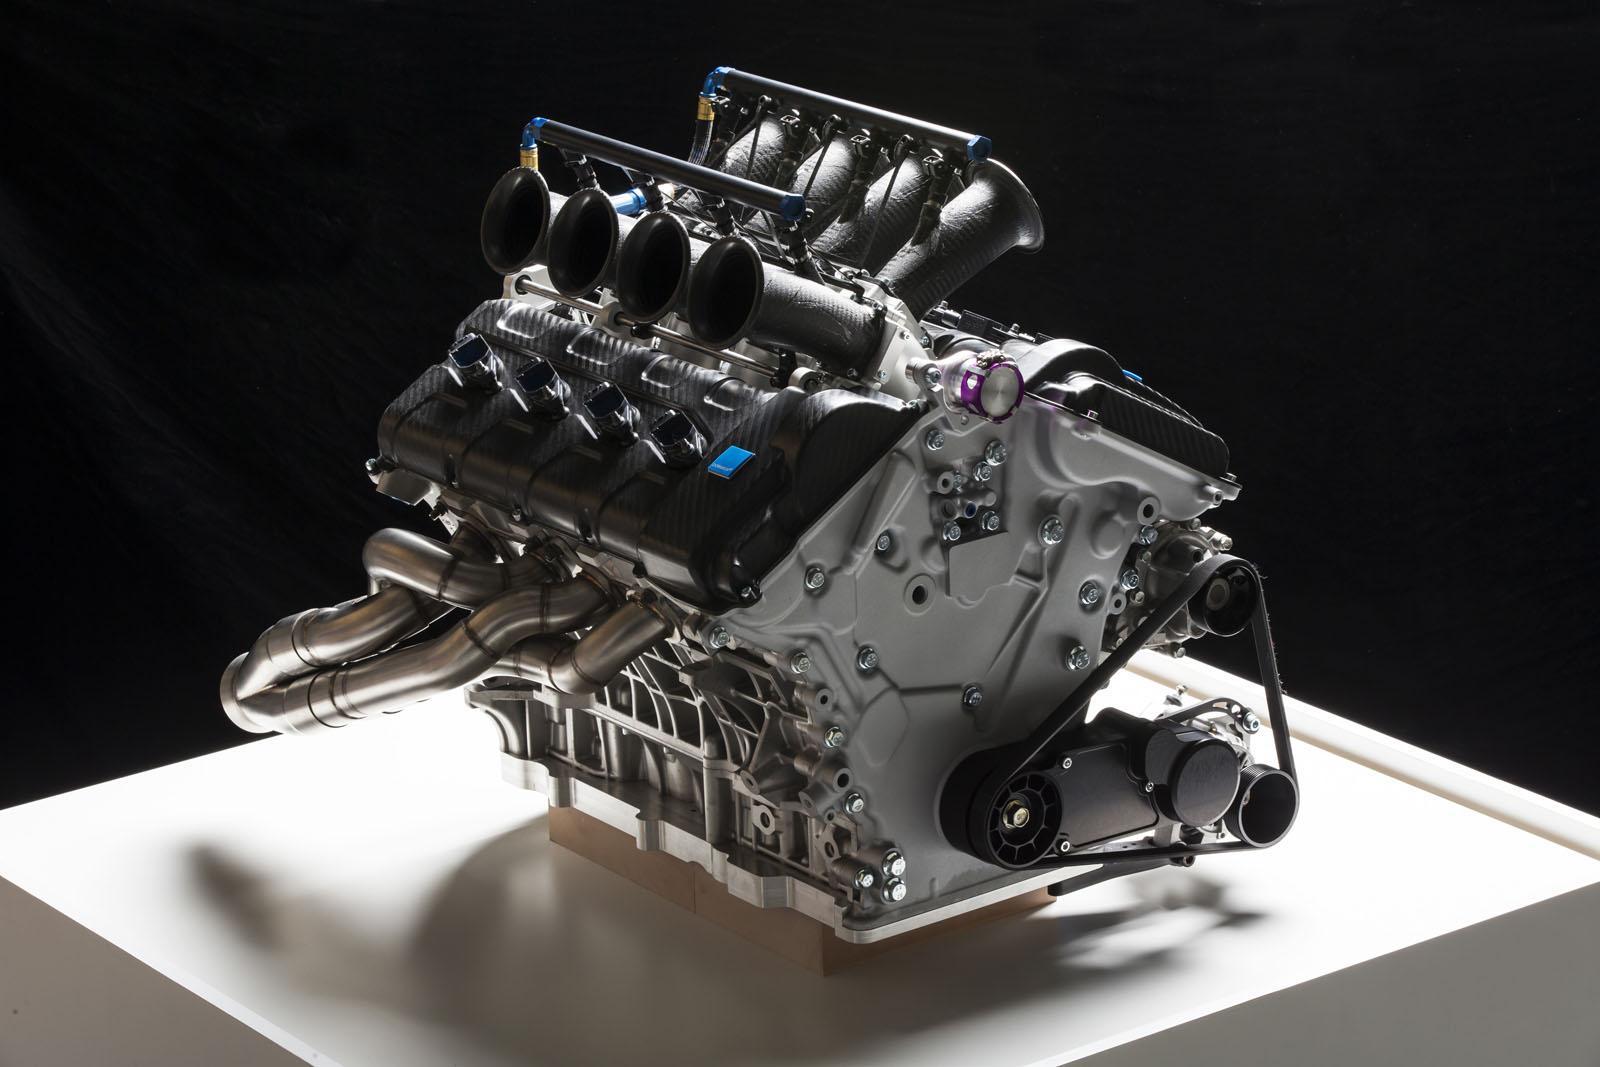 New Volvo Xc90 >> Volvo Shows 5.0-liter V8 Engine for Australian V8 Supercar ...